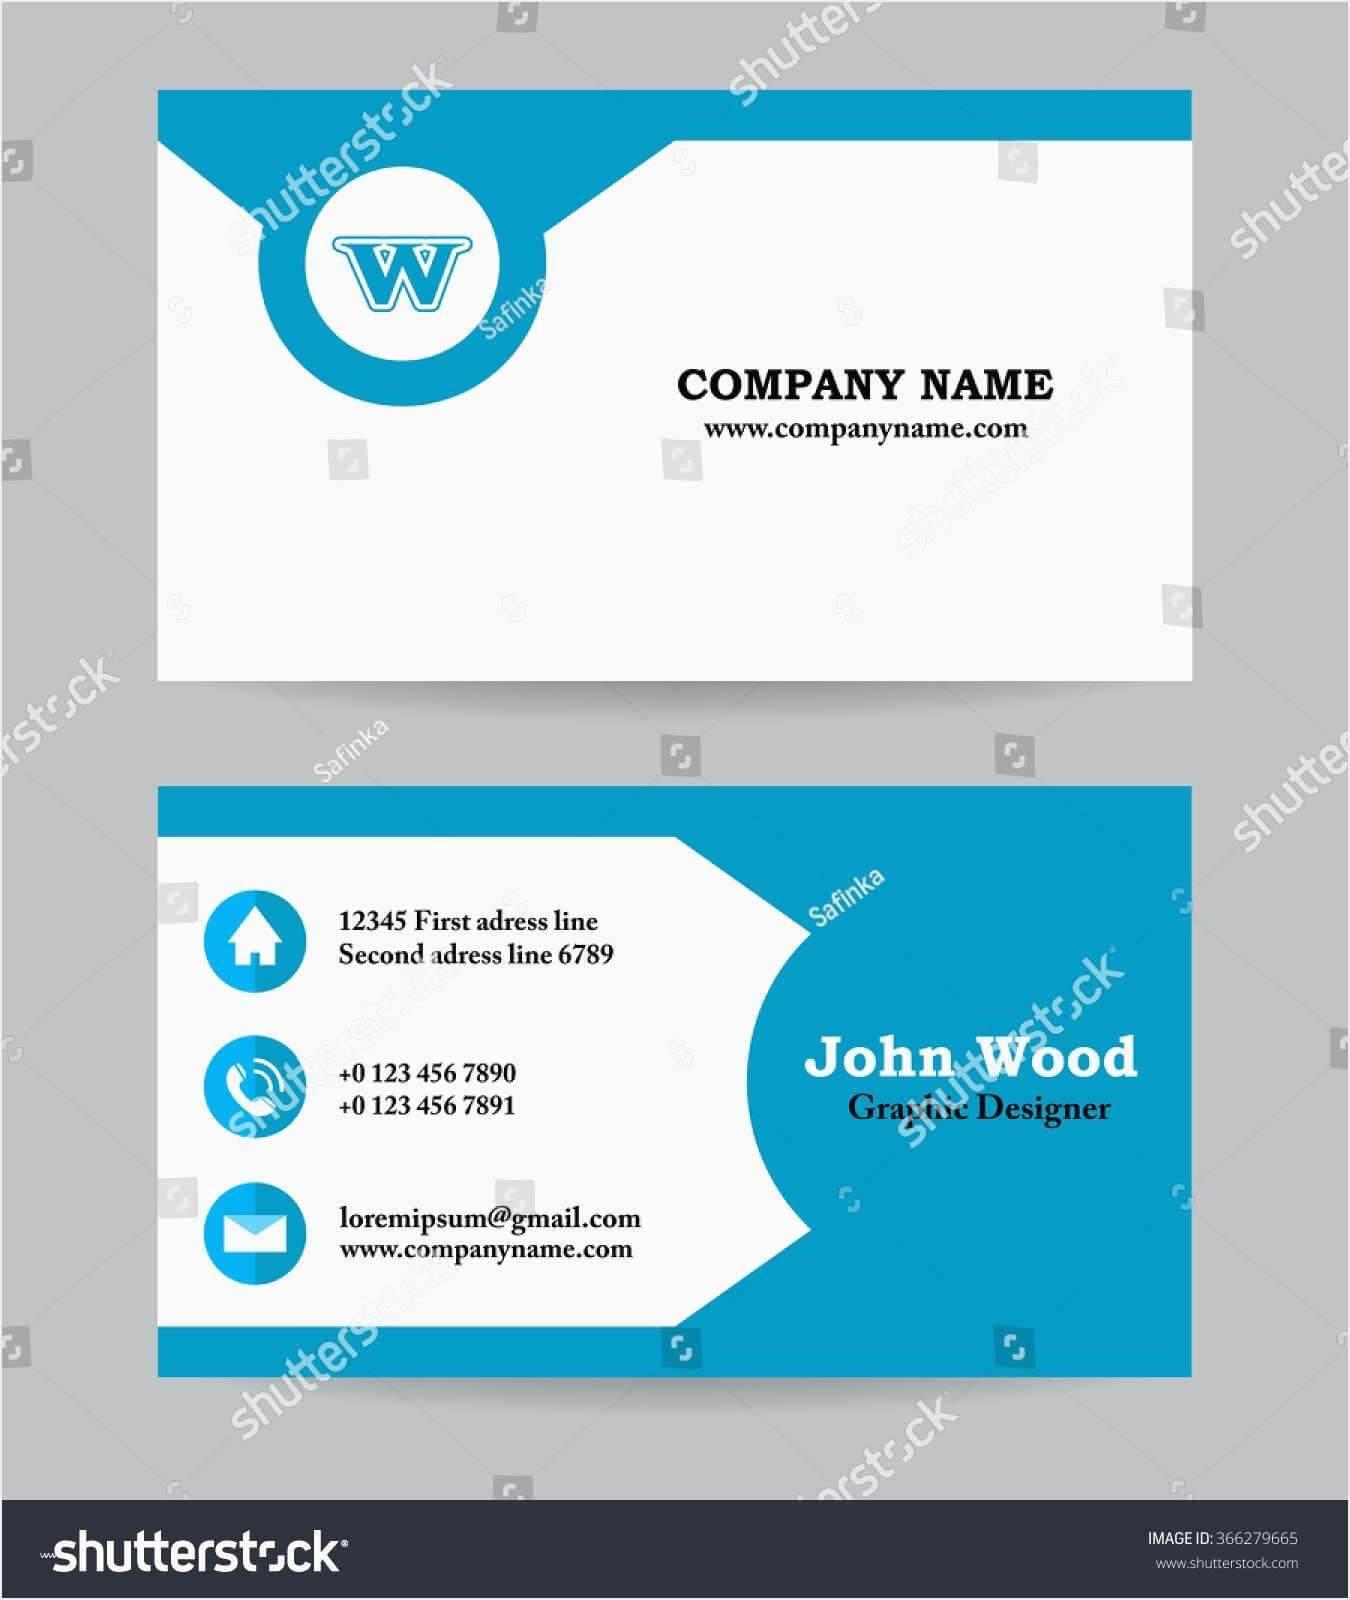 Ibm Business Card Template - Caquetapositivo With Ibm Business Card Template